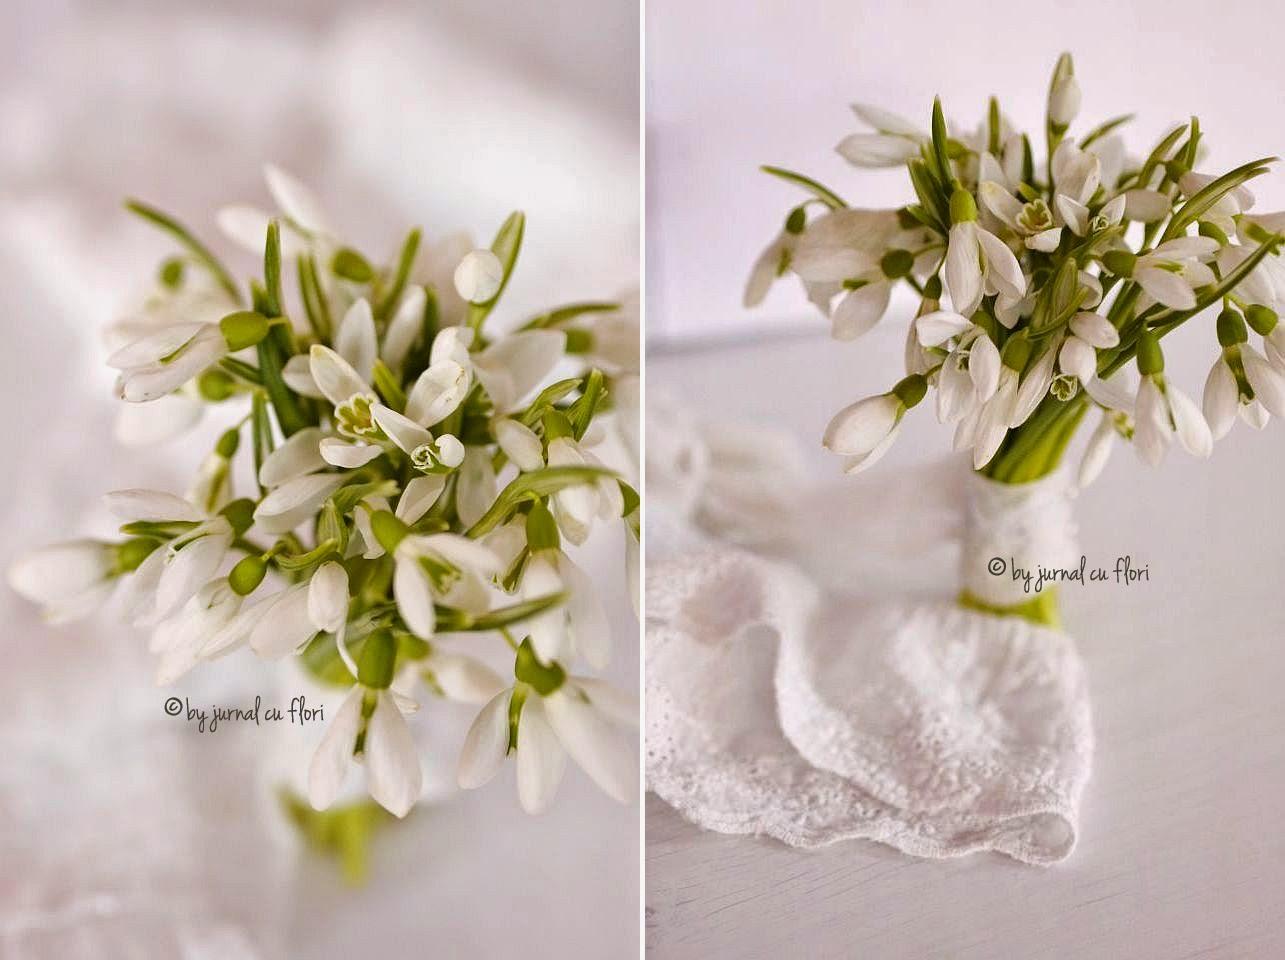 buchet de ghiocei si dantela  shabby chic snowdrop galantus lace bouquet Schneeglöckchenstrauss